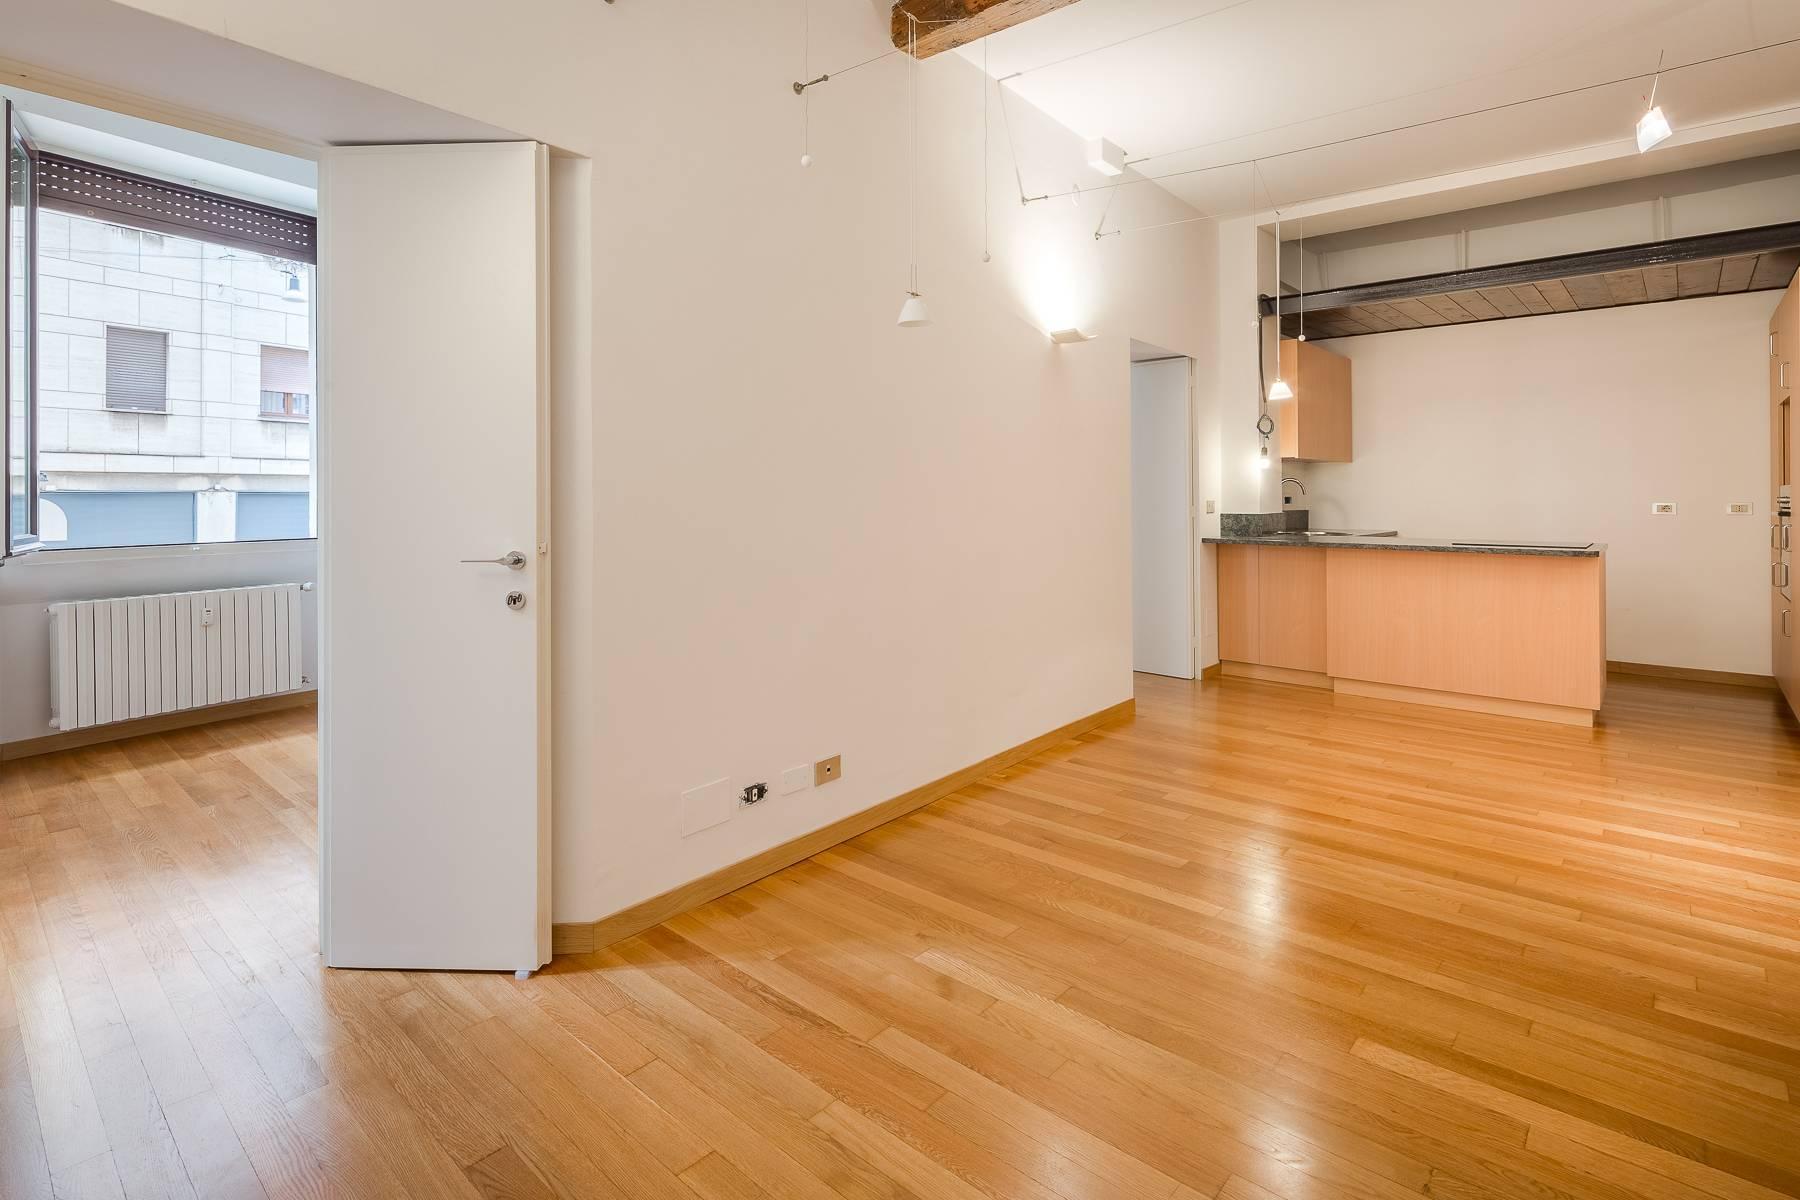 Apartment in an elegant period building located in a prestigious city district - 24